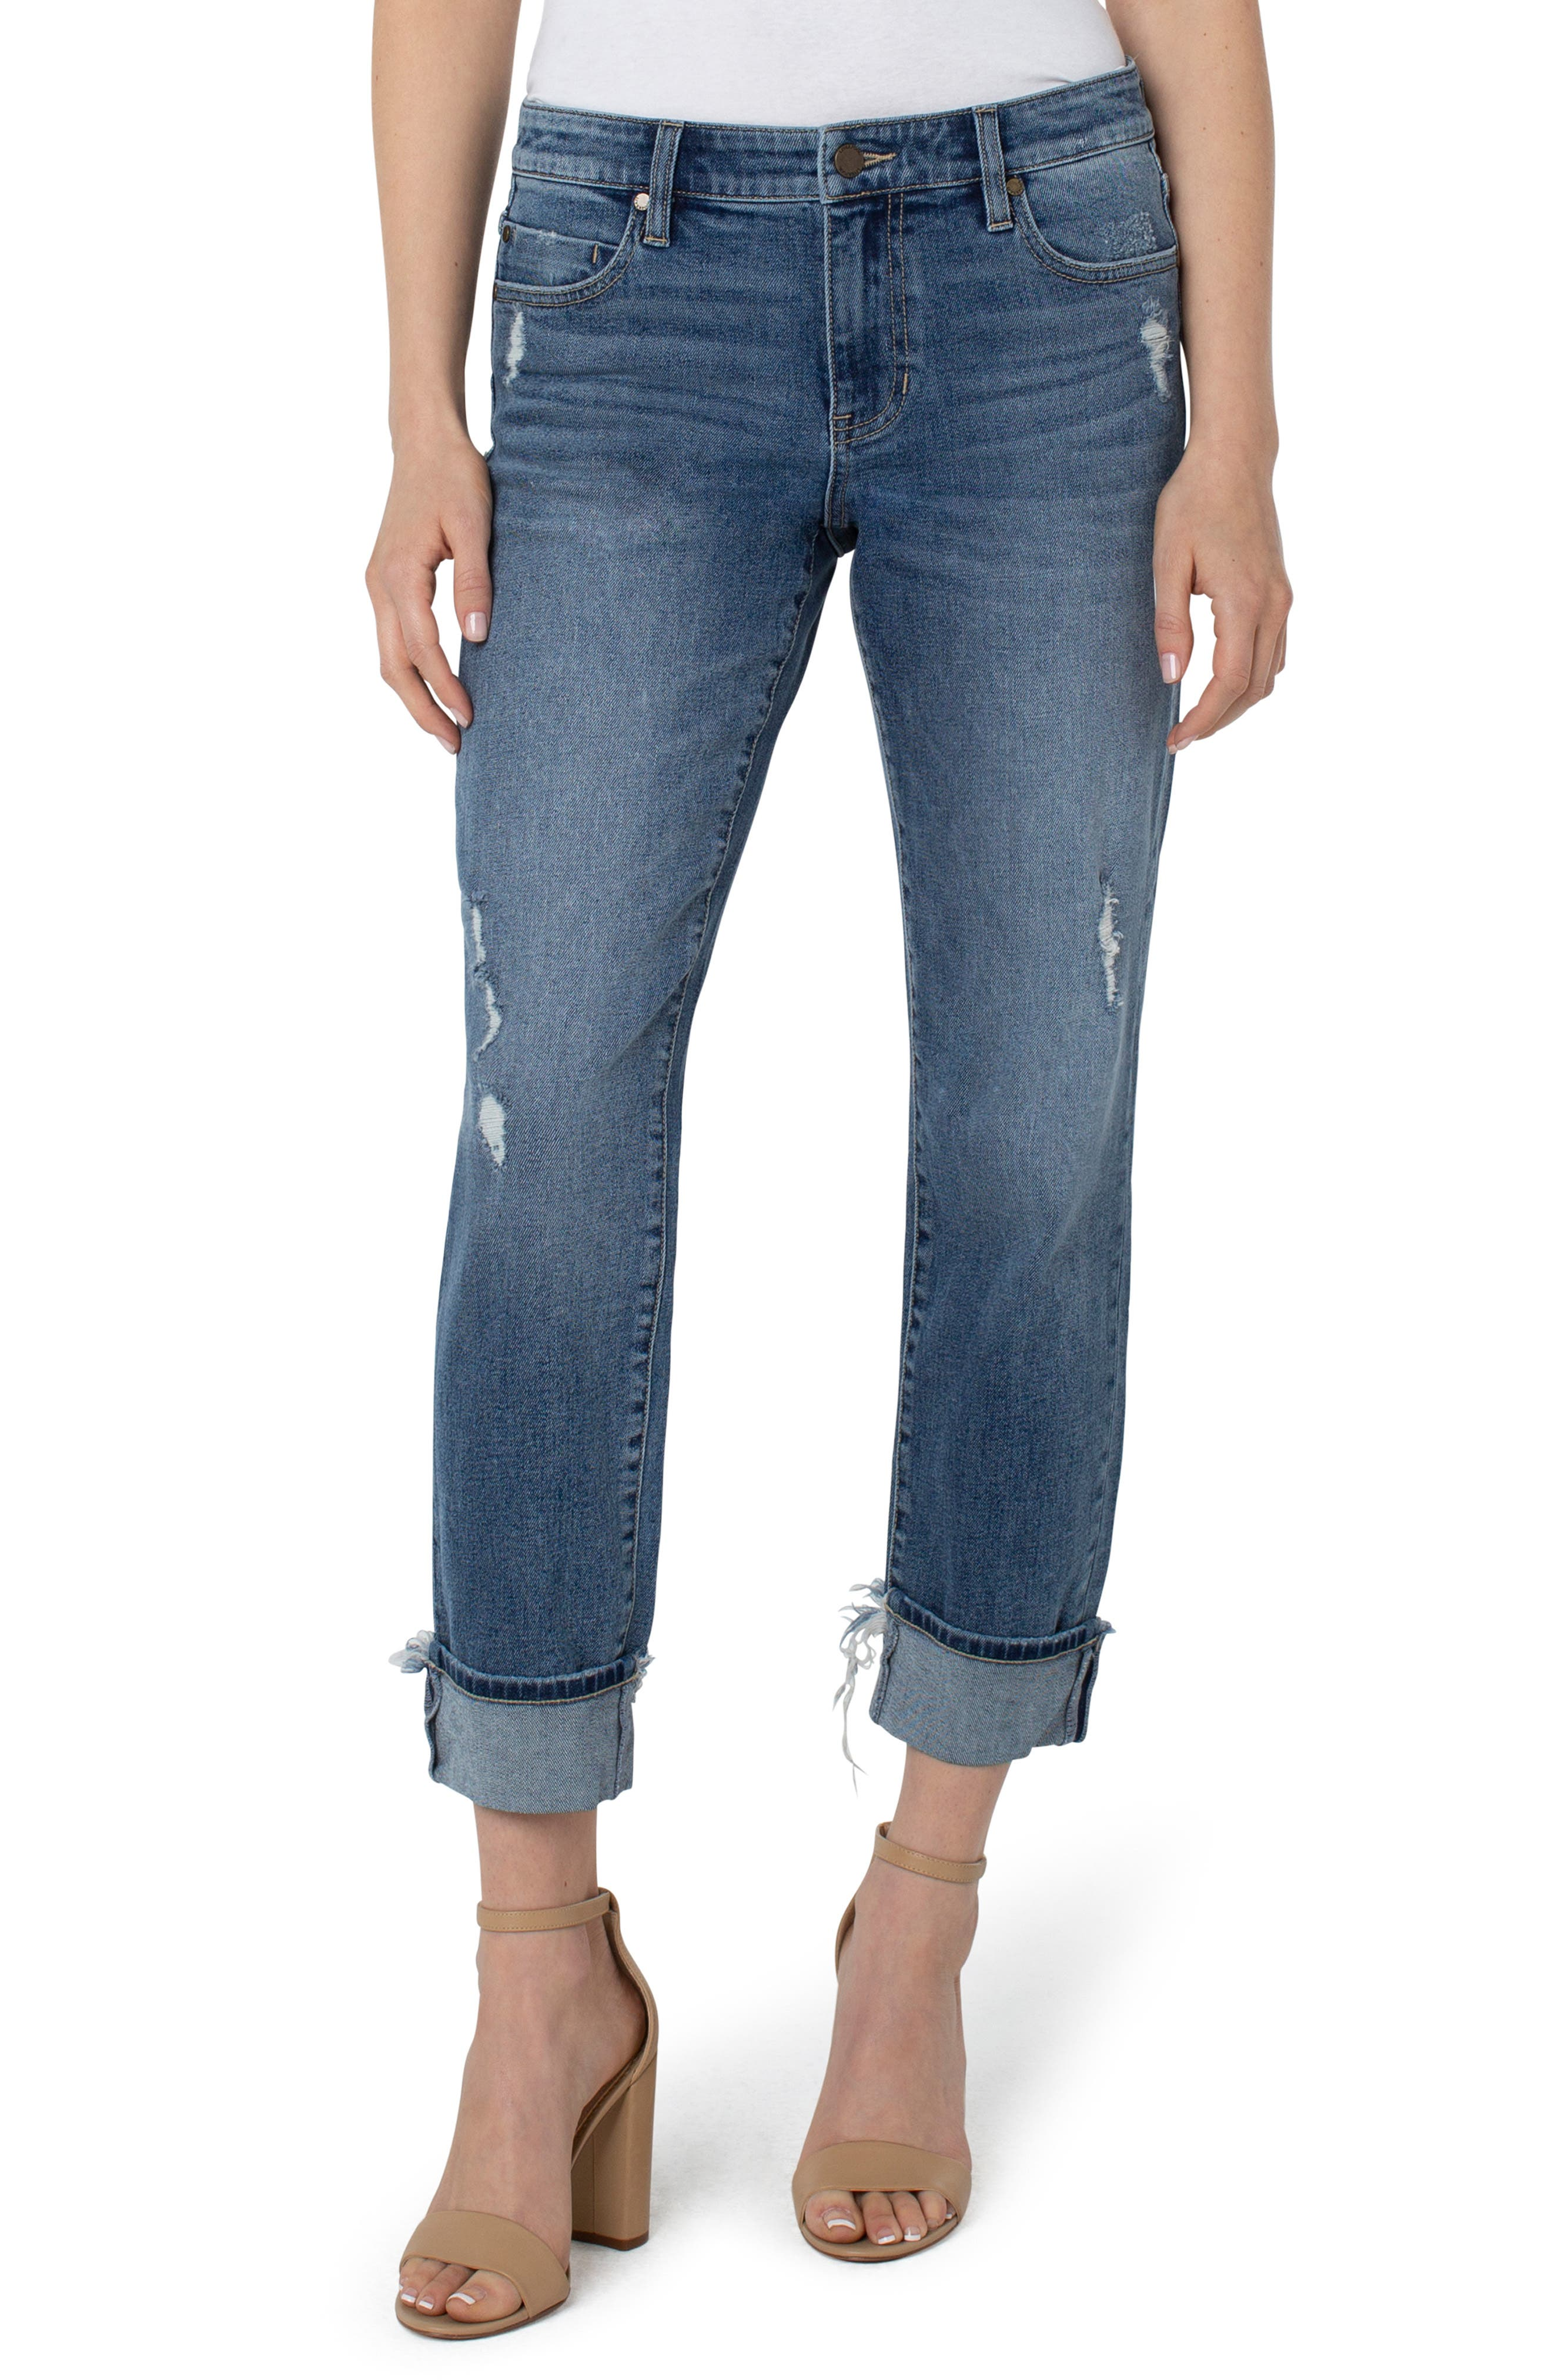 Marley High Waist Distressed Girlfriend Jeans